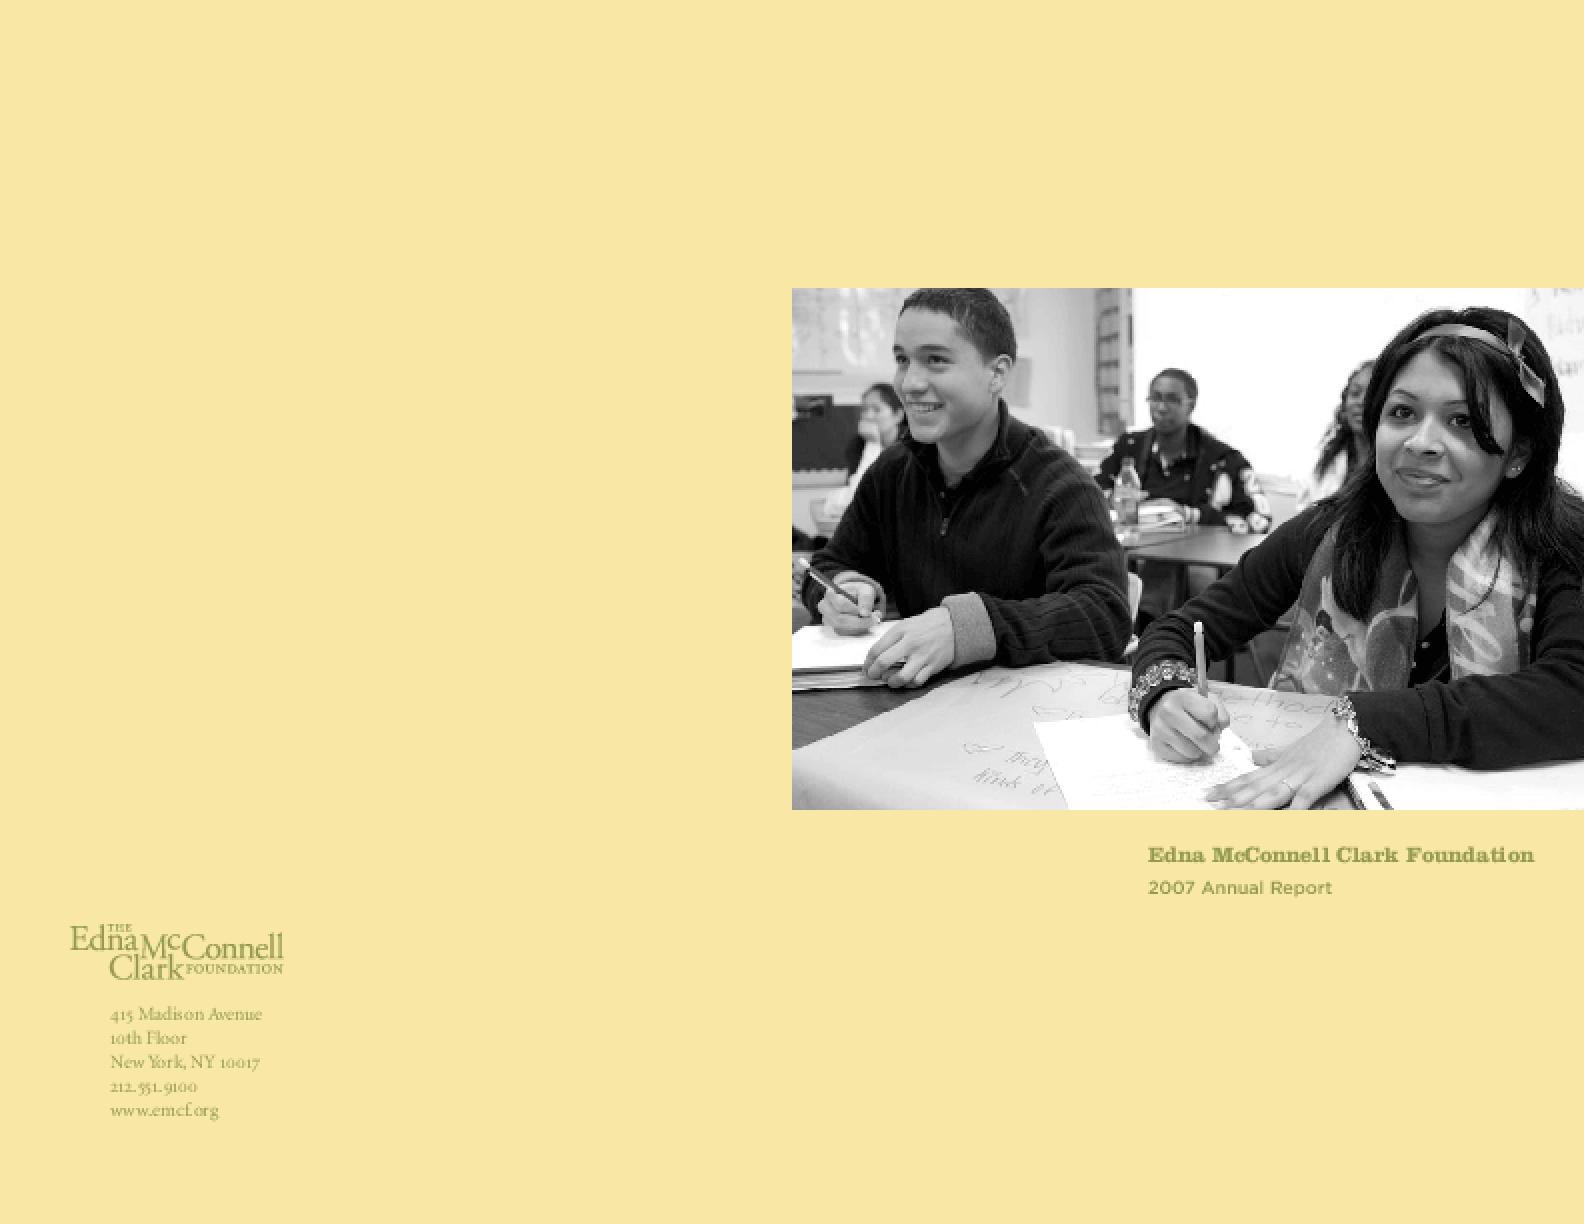 Edna McConnell Clark Foundation - 2007 Annual Report